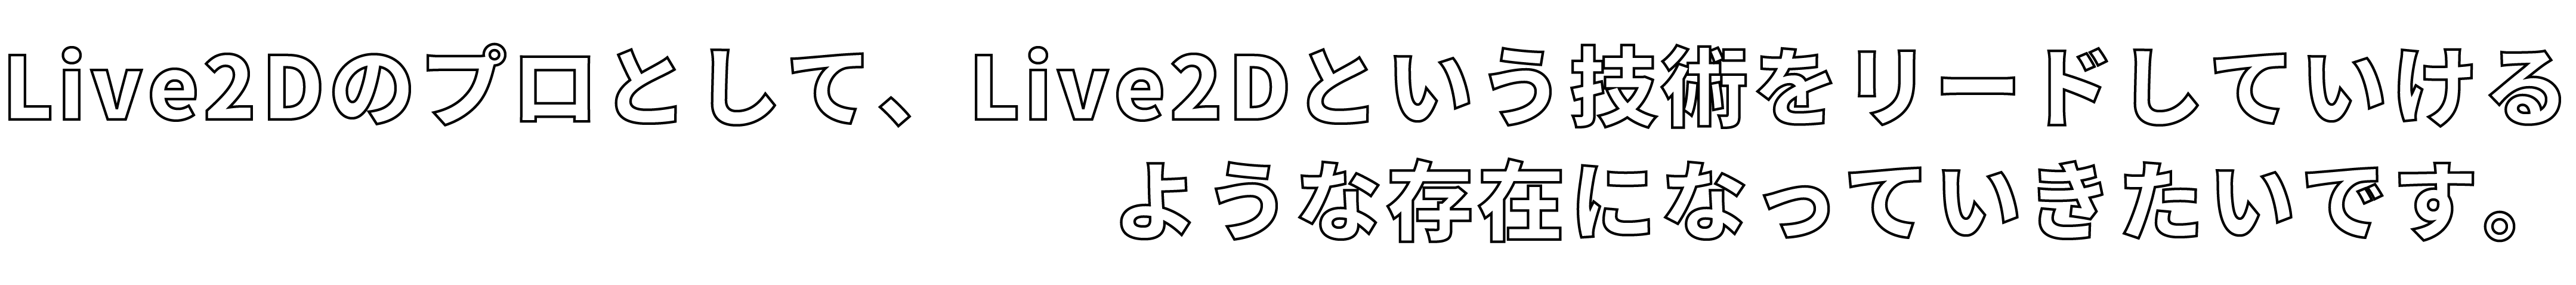 Live2DのプロとしてLive2Dという技術をリードしていけるような存在になっていきたいです。